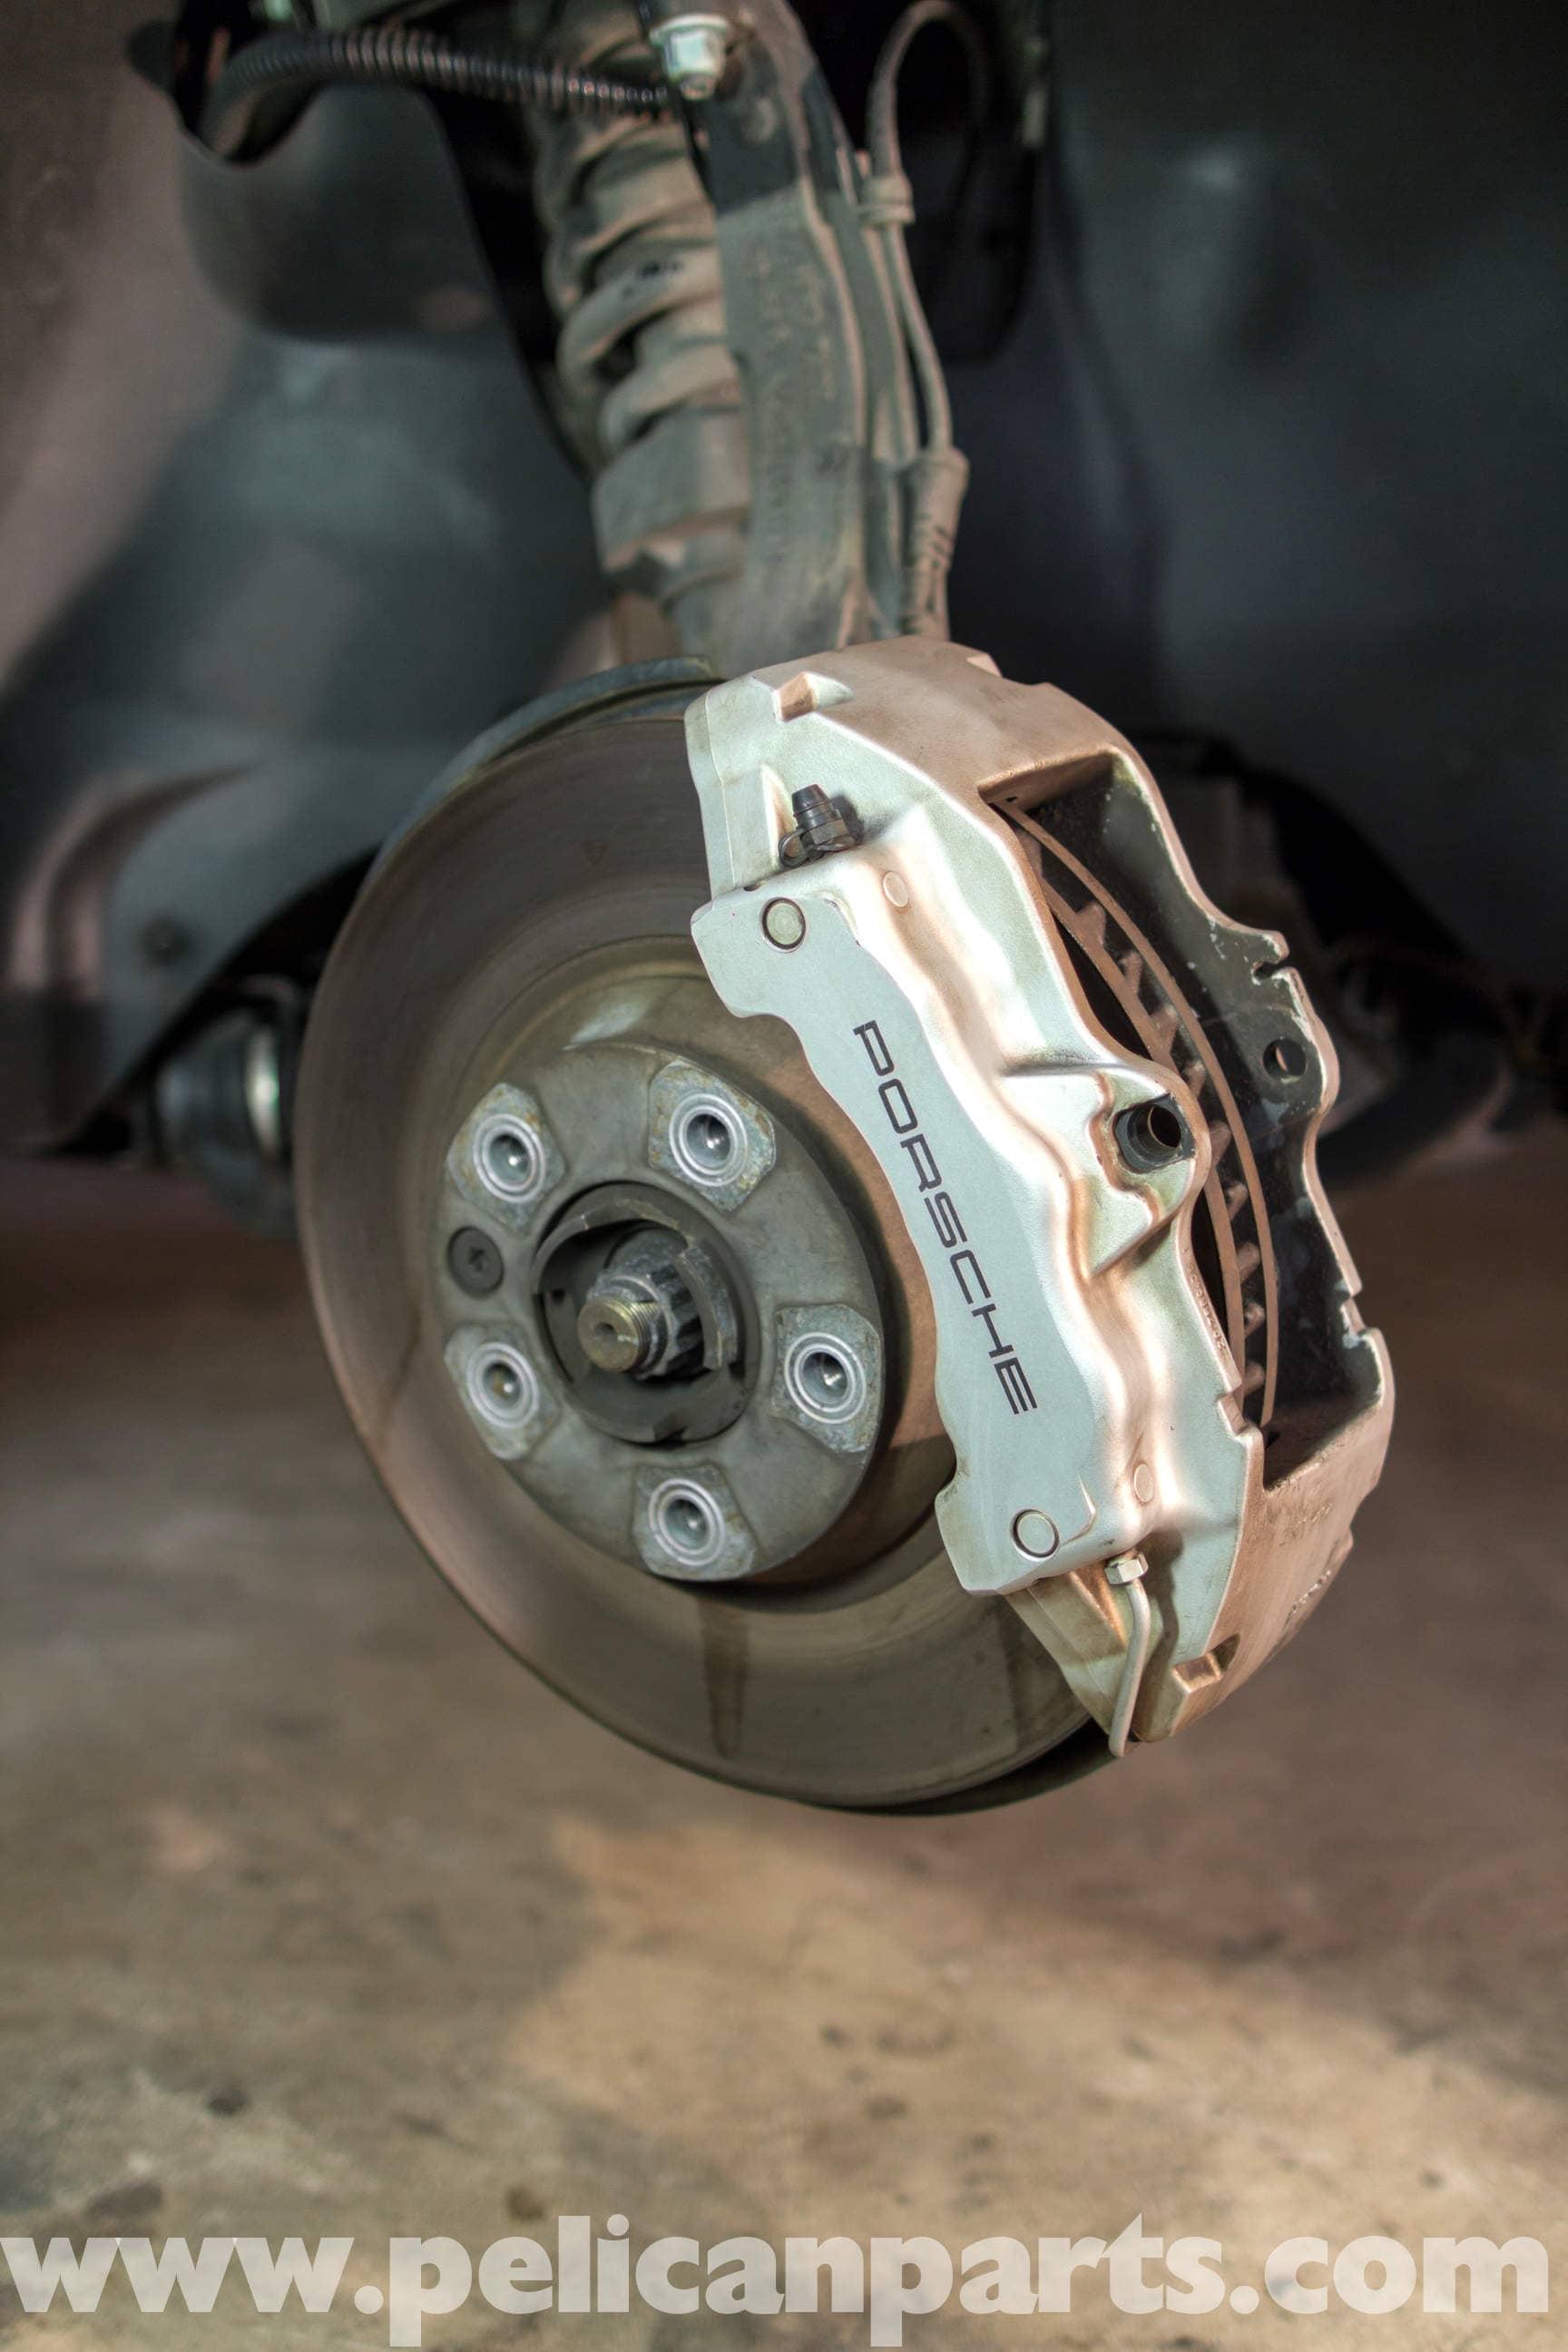 Porsche Cayenne Front Brake Pad Replacement